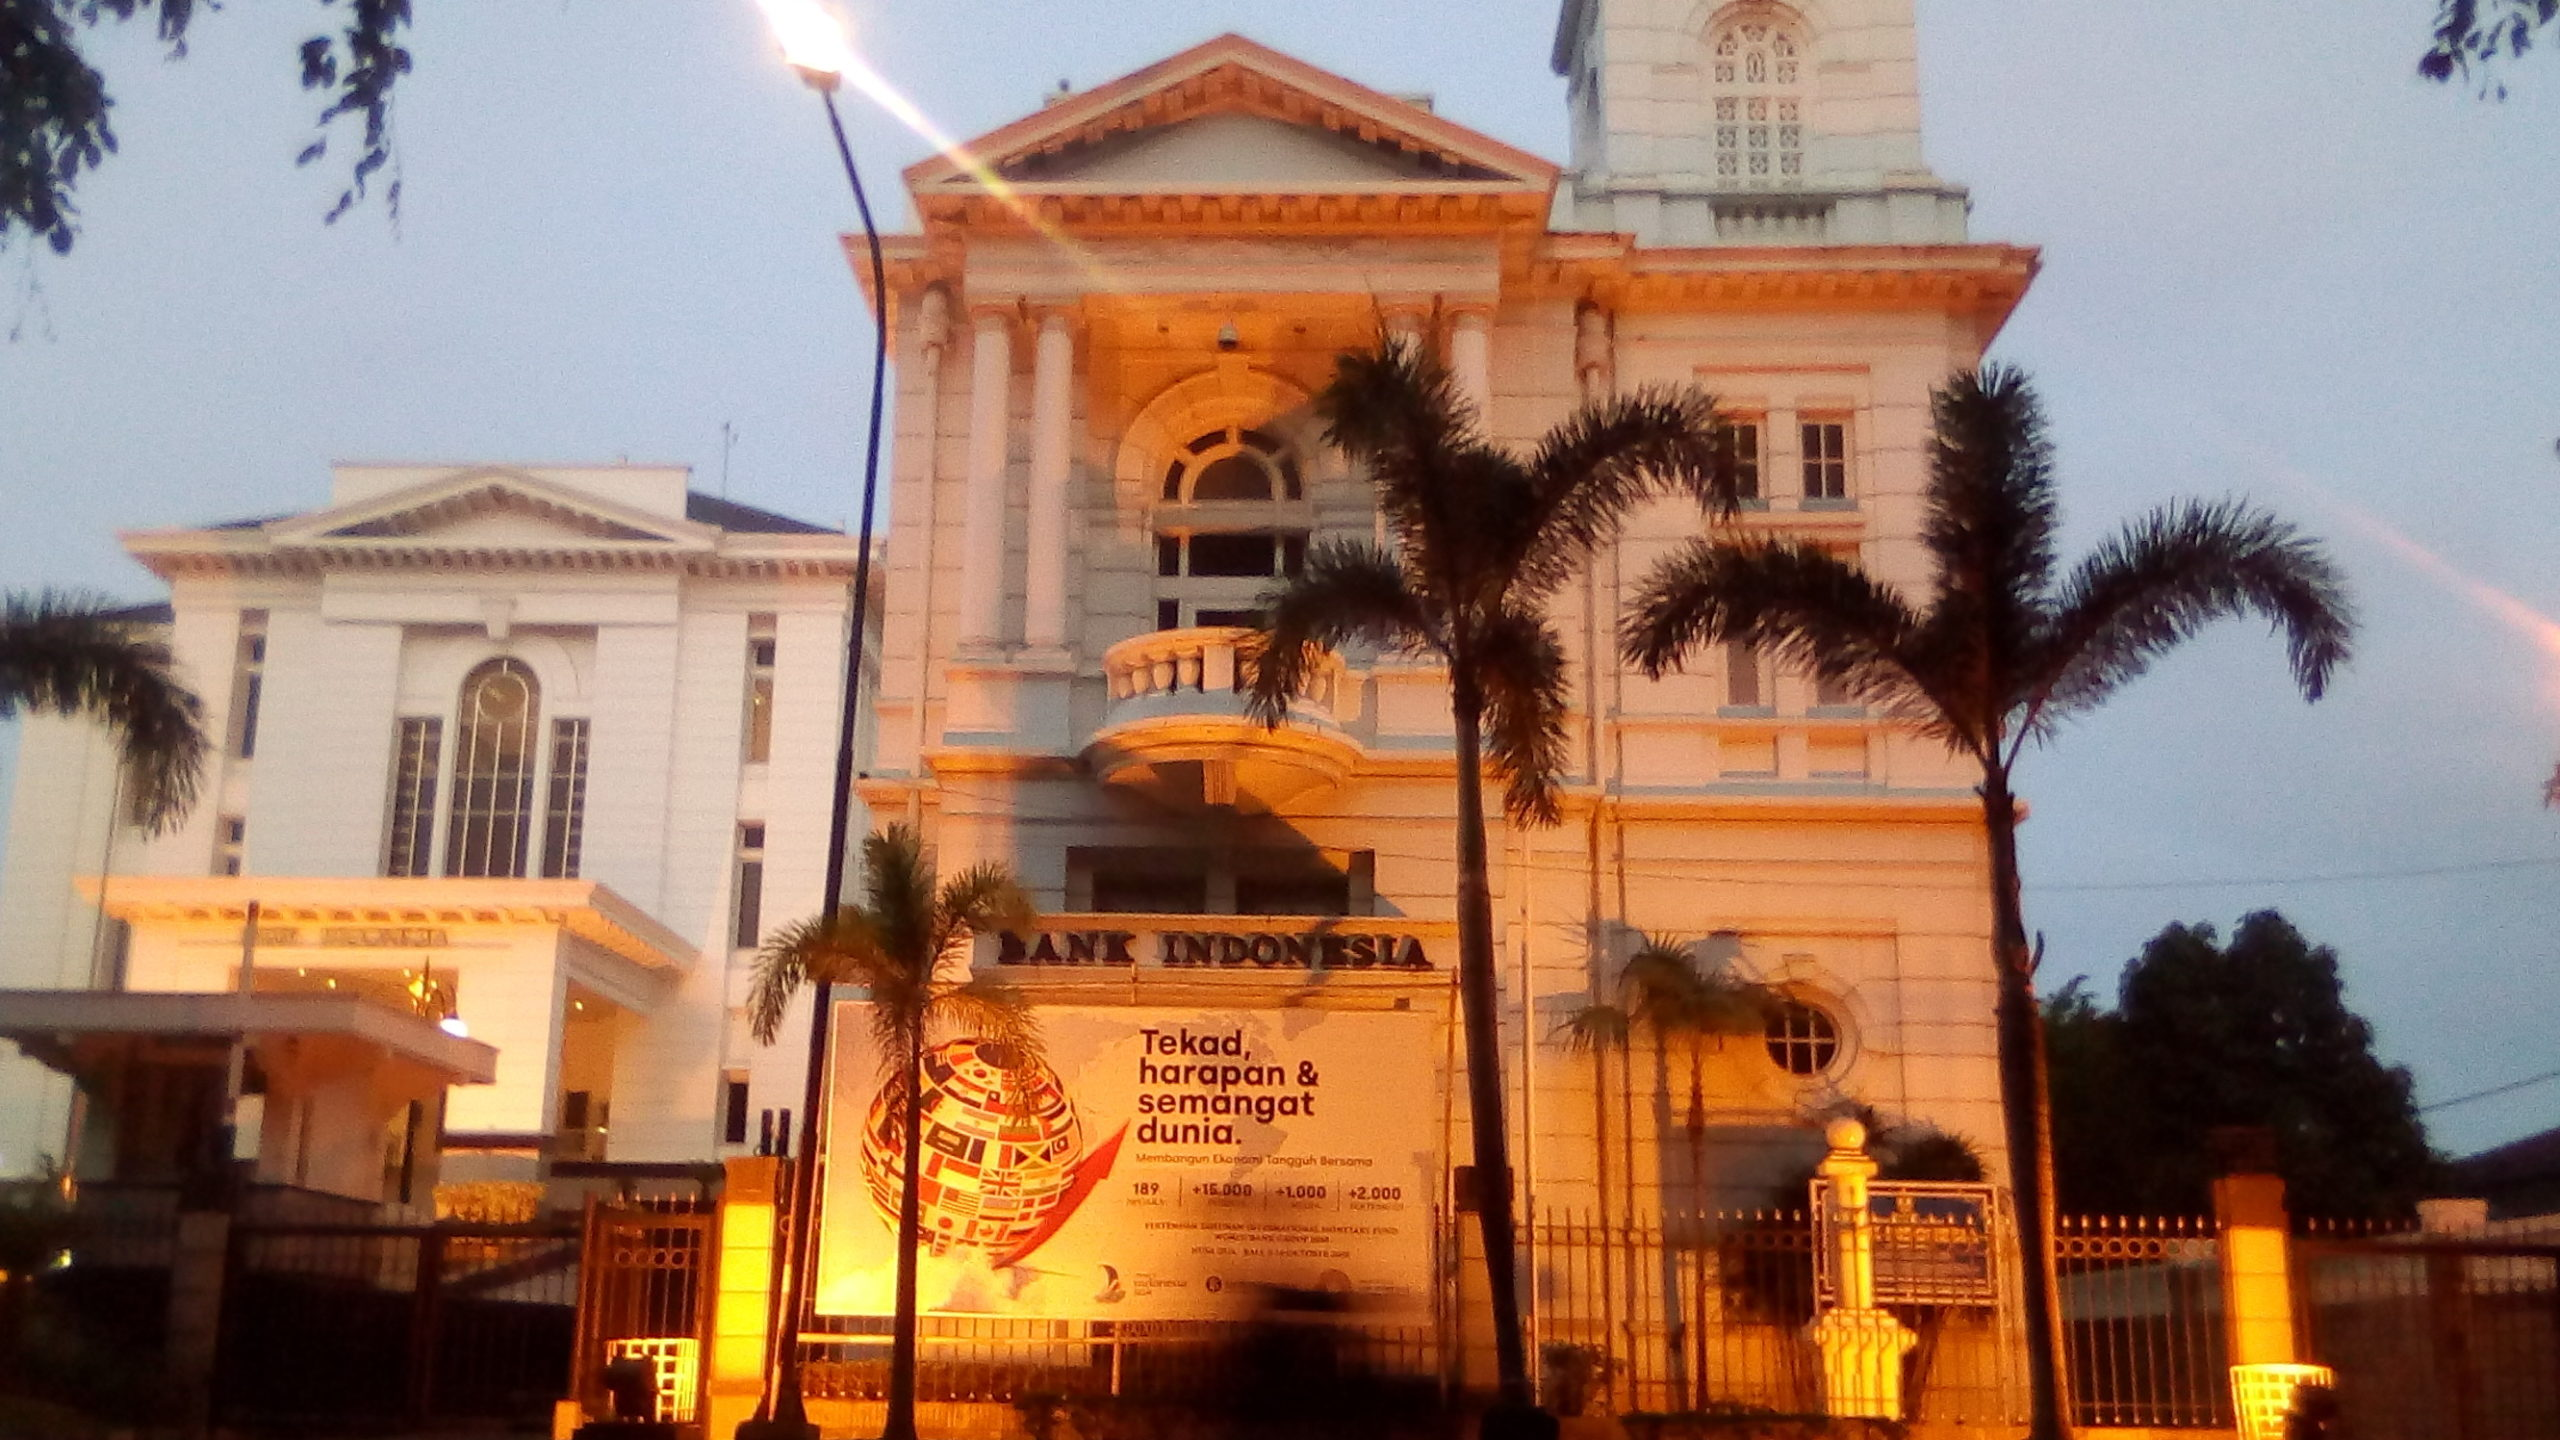 Bank Indonesia Di Cirebon Gedung De Javasche Bank ( Gedung BI )